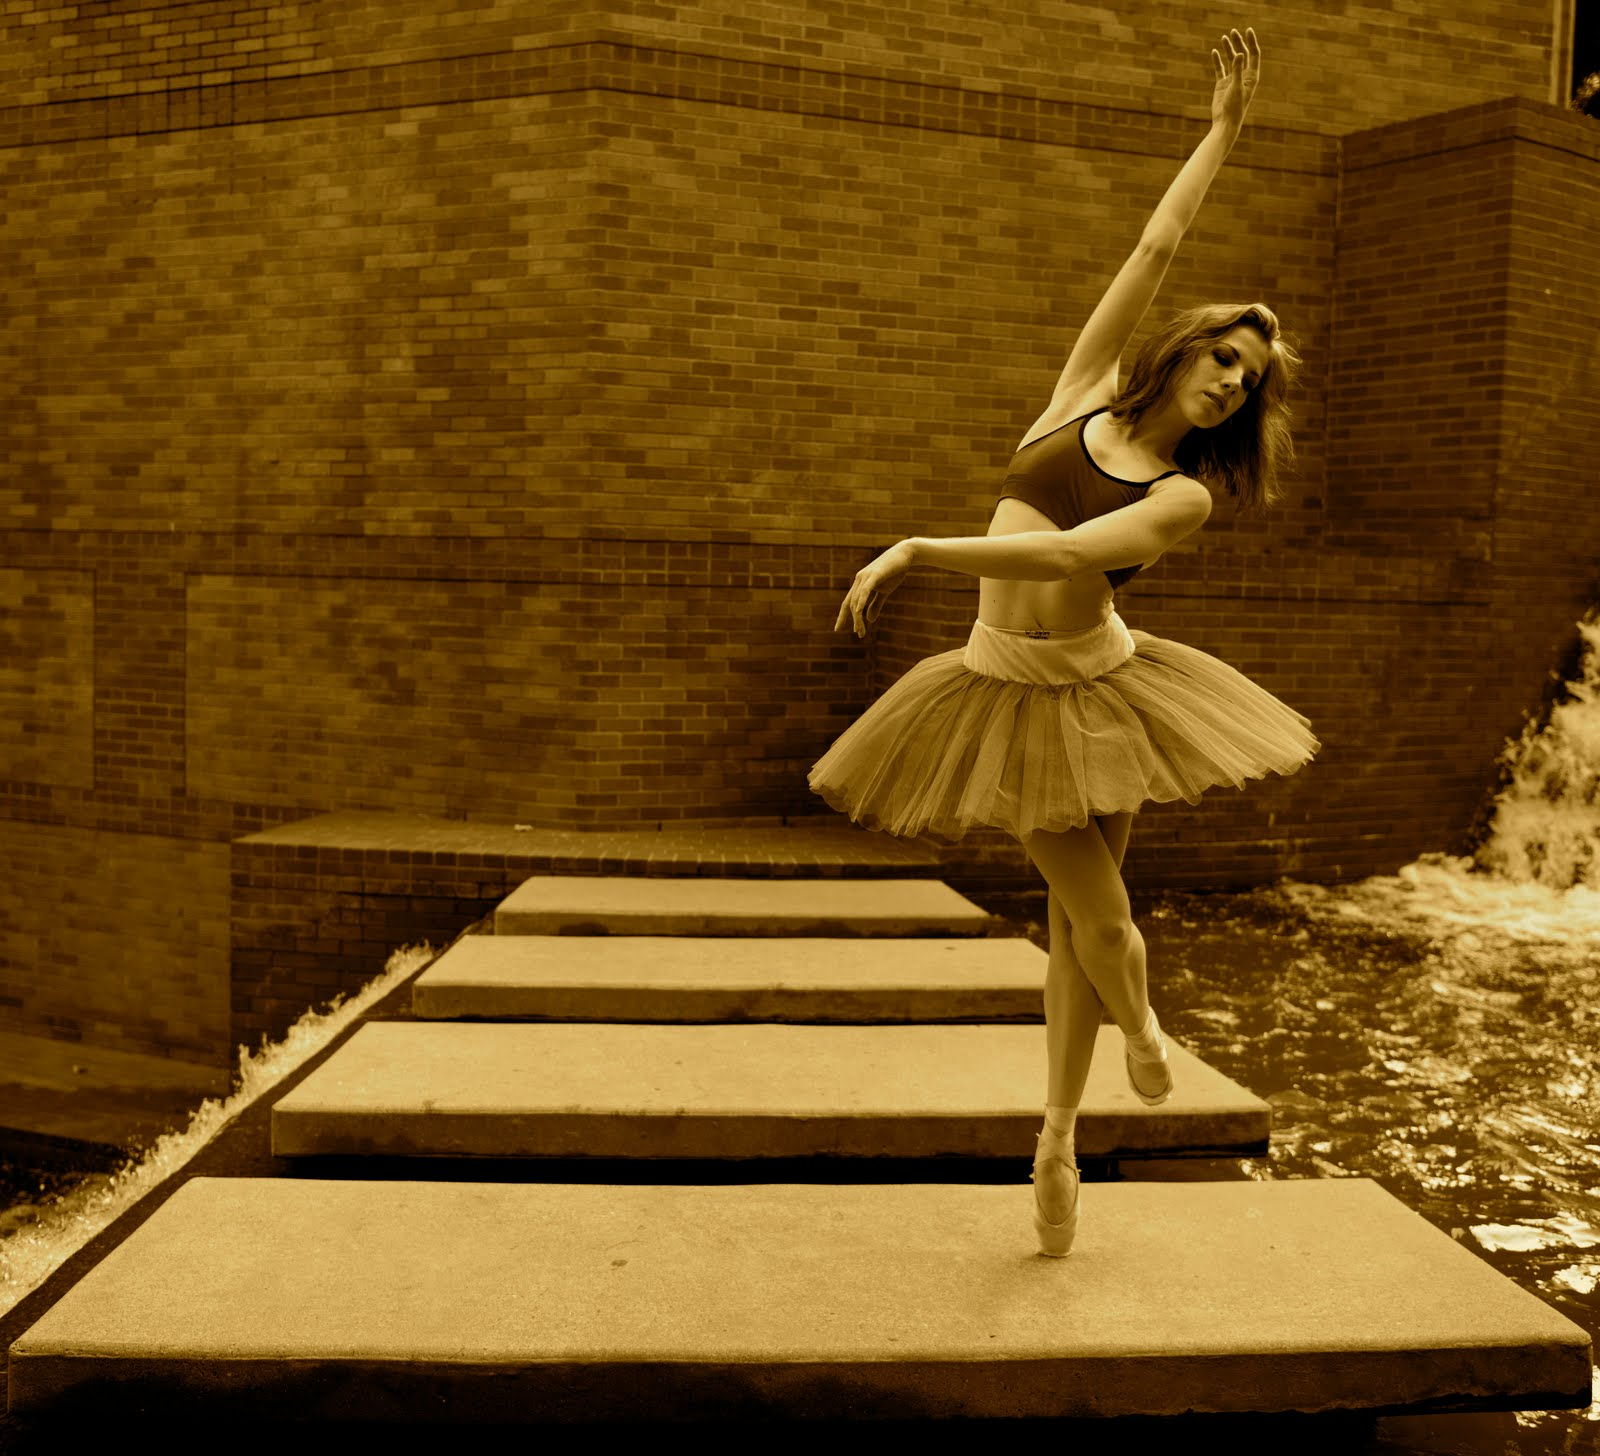 Ballerina by day escort by night